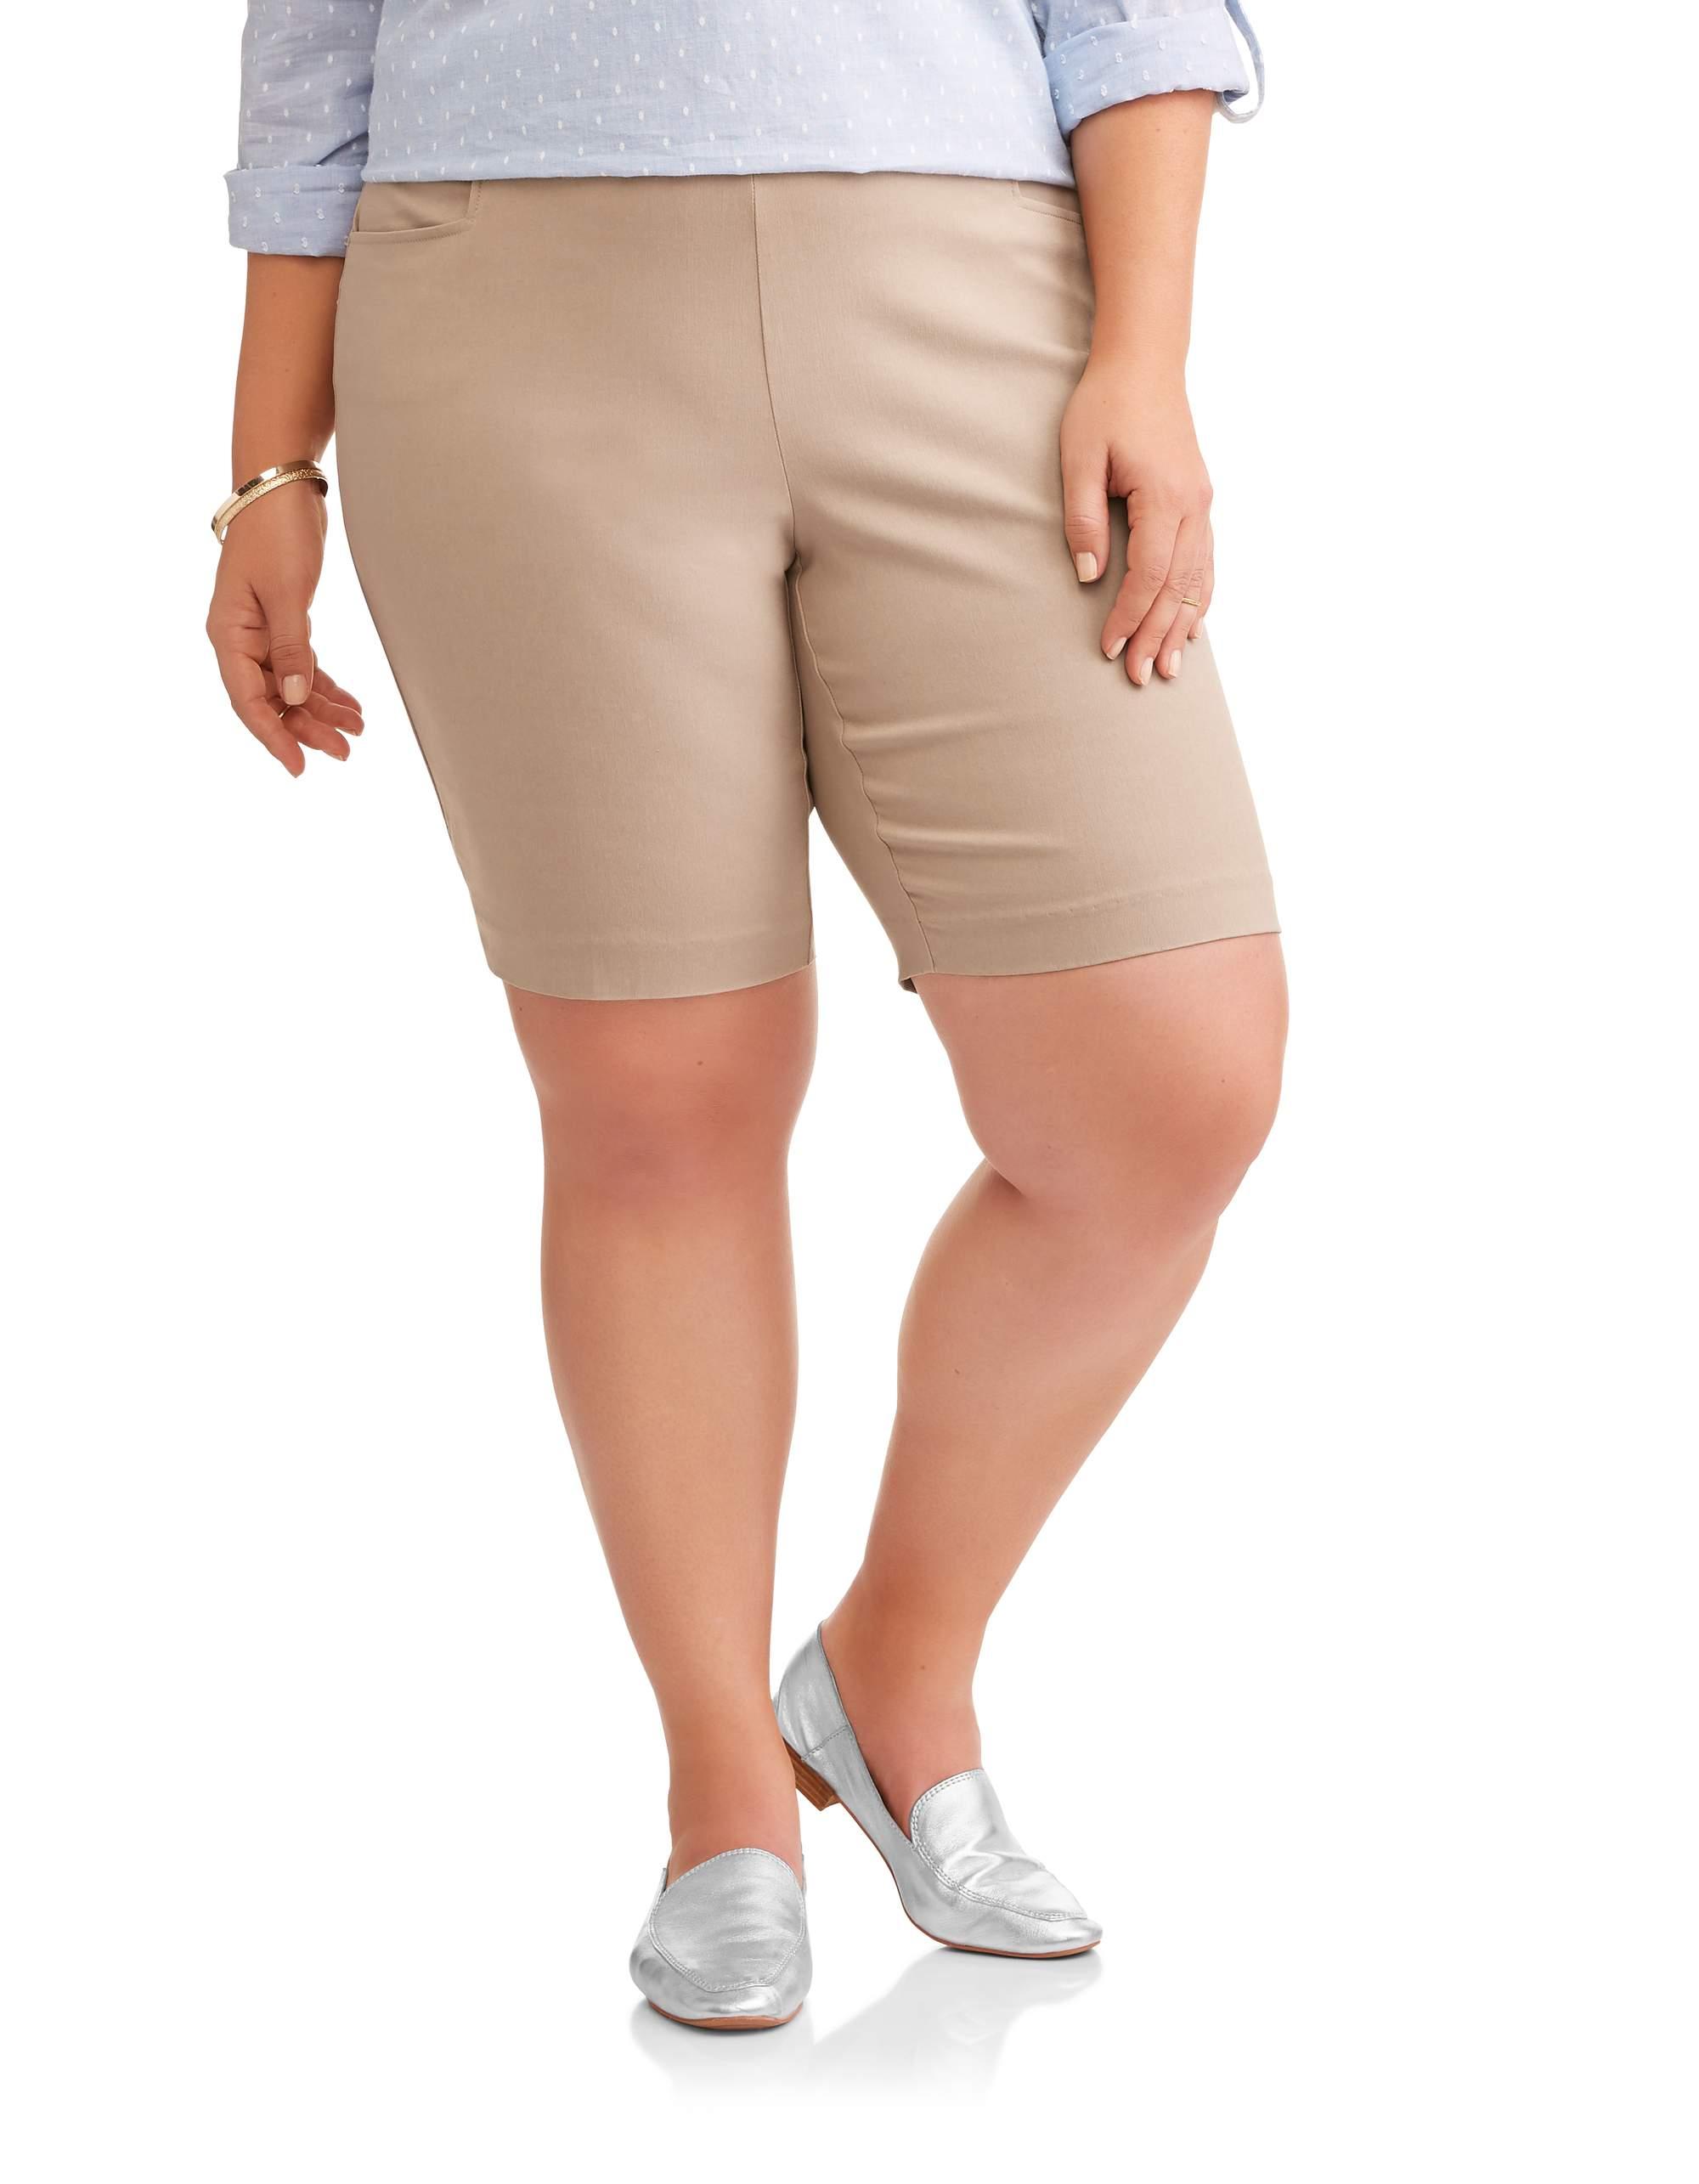 Terra & Sky Women's Plus Stretch Woven Bermuda Short